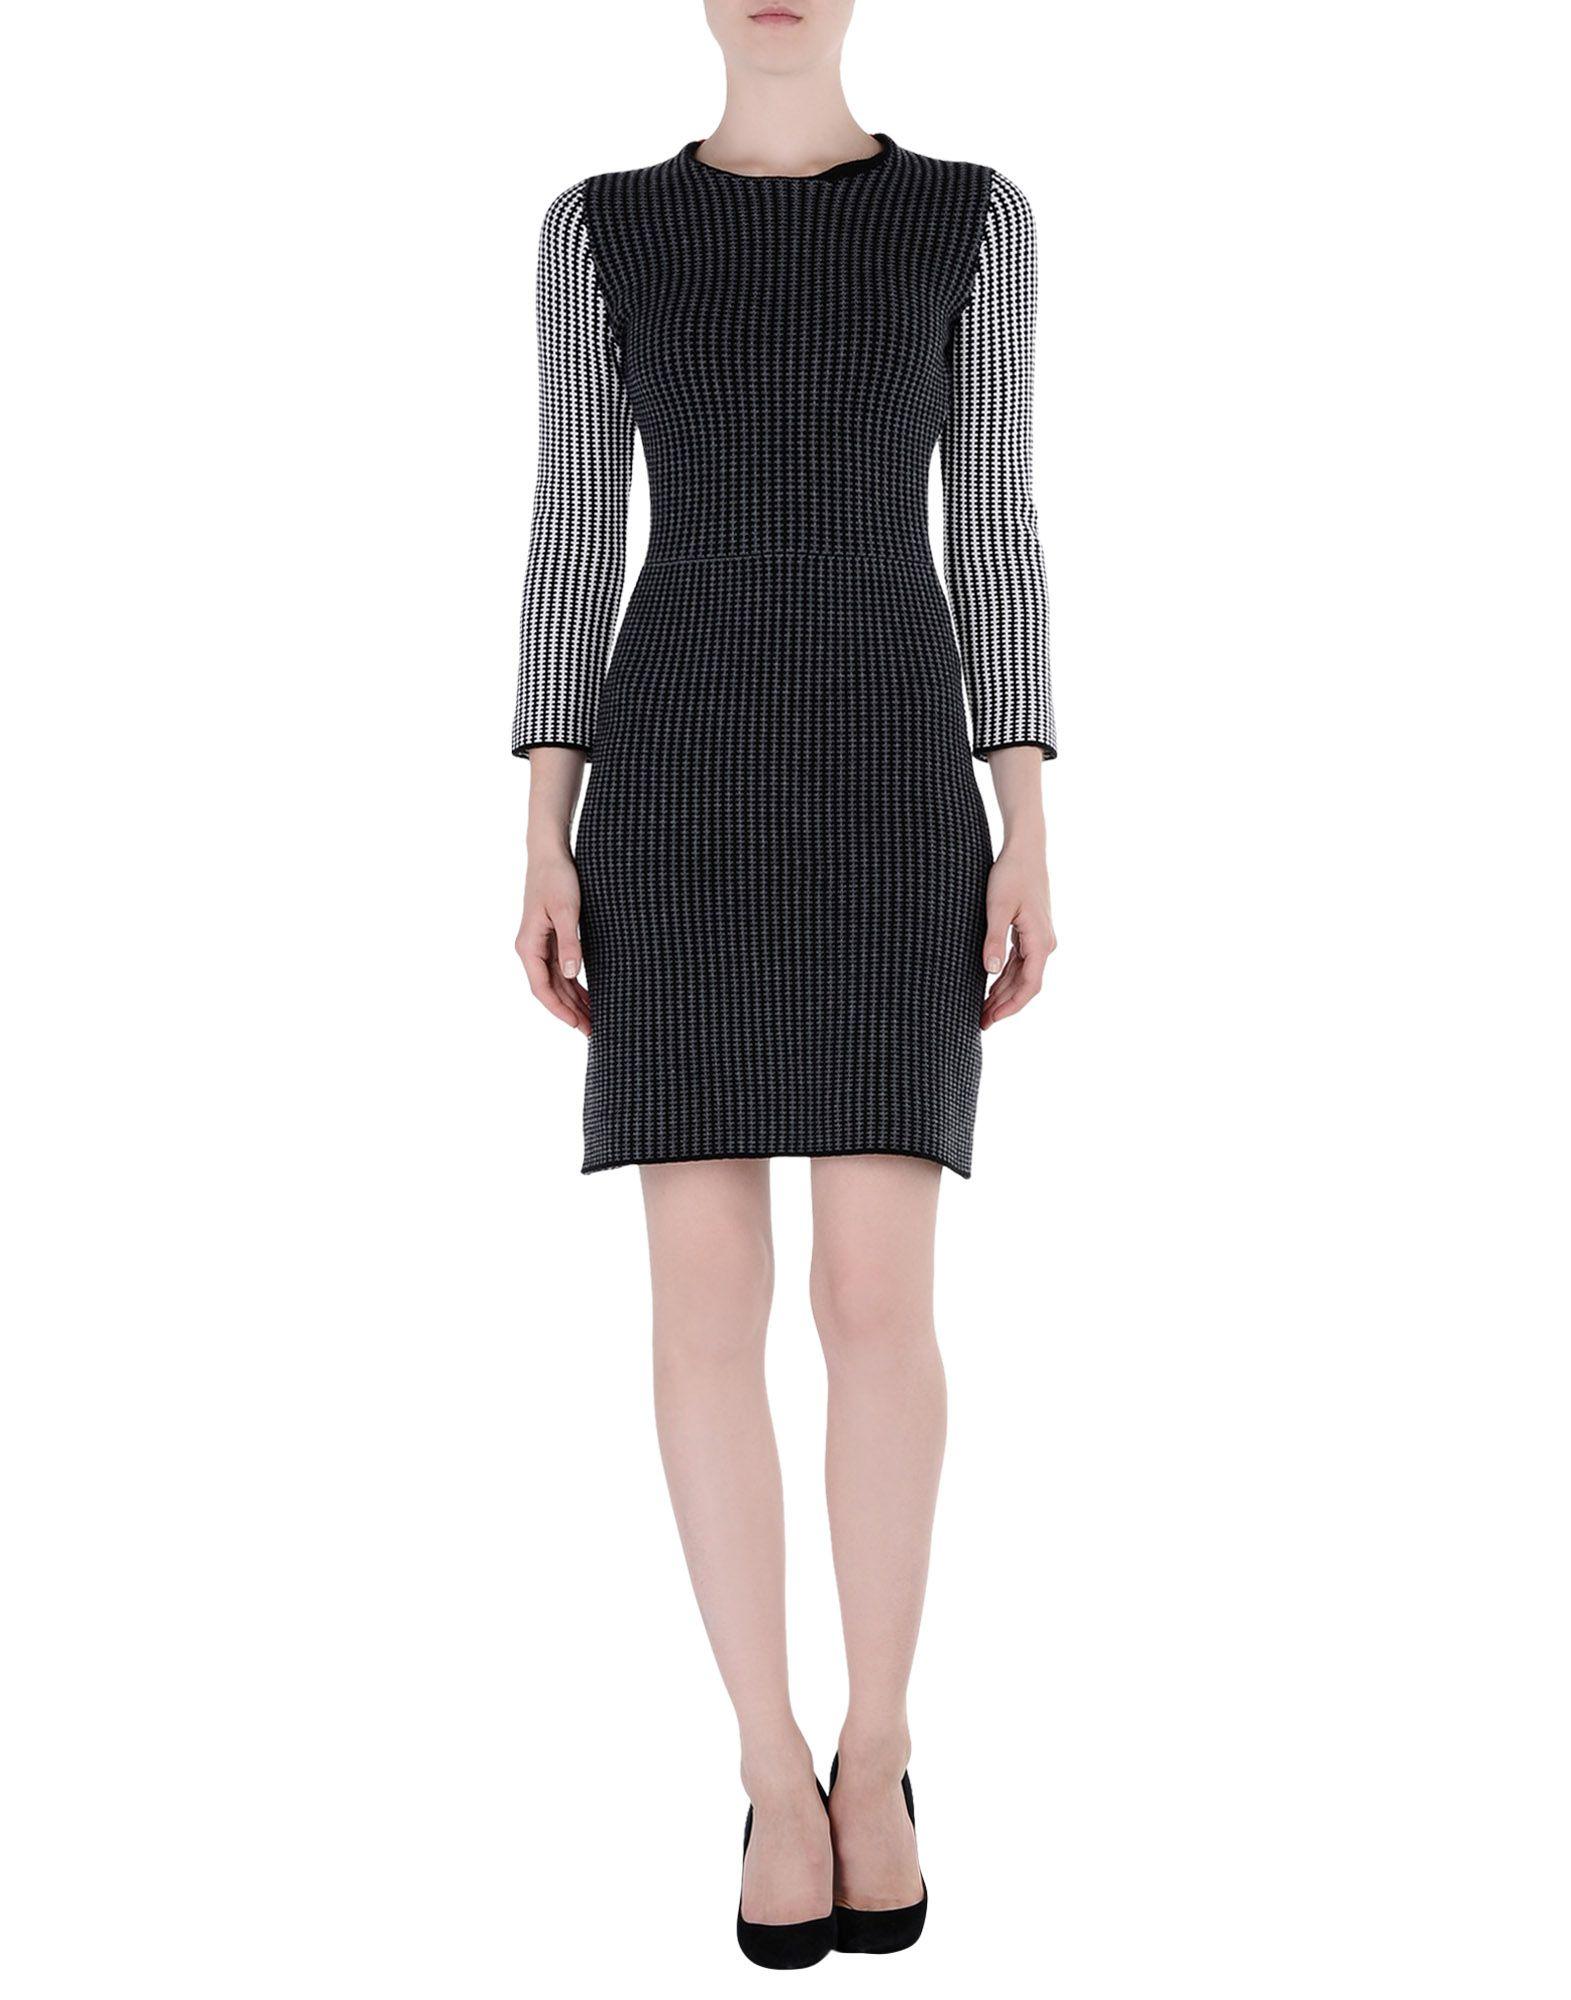 dior short dresses - photo #12